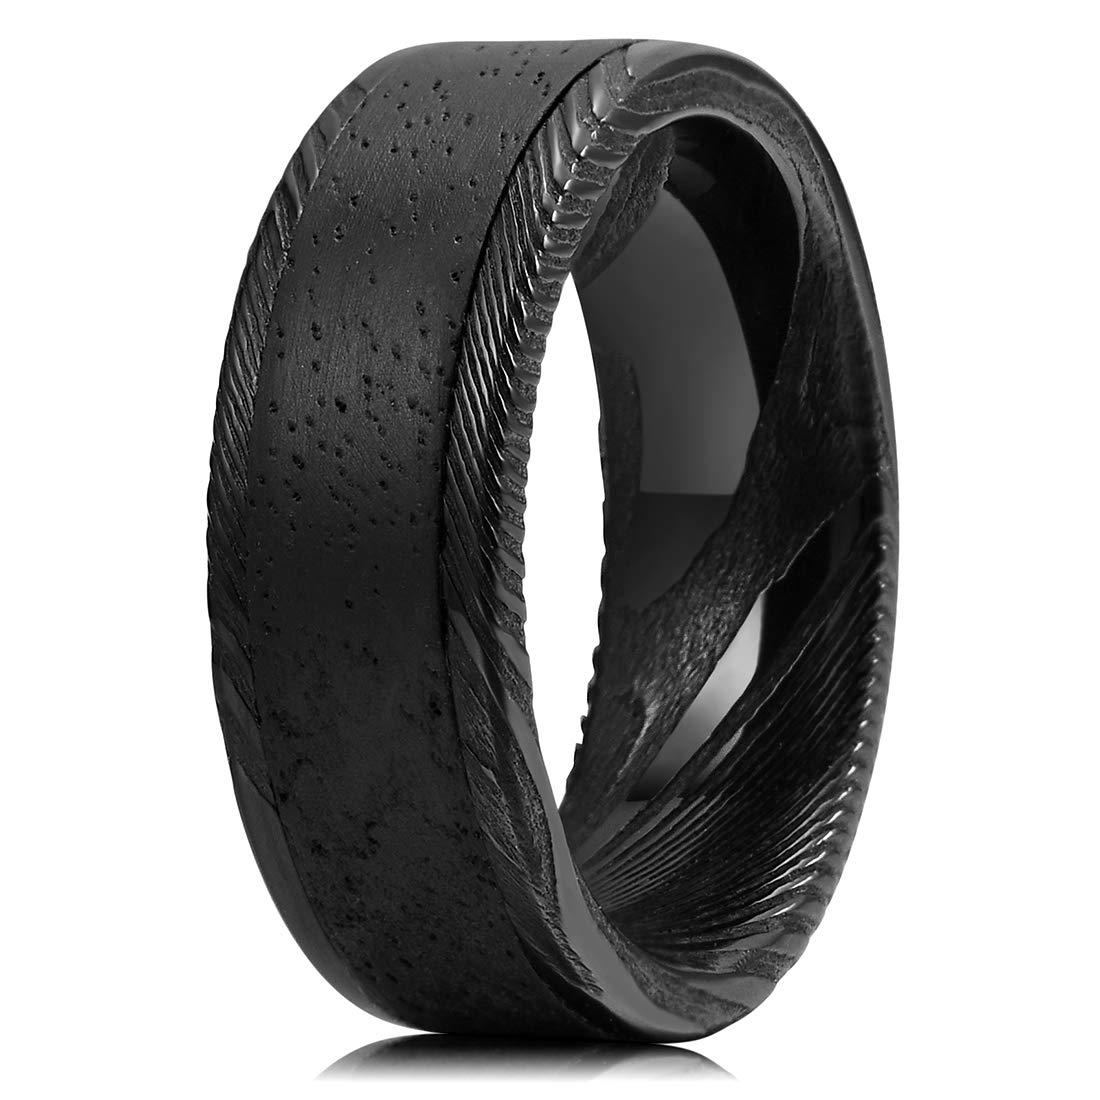 Three Keys Jewelry 8mm Damascus Steel Mens Wedding Ring Wood Grain Ebony Wood Inlay Black Wedding Band Engagement Ring Size 12.5